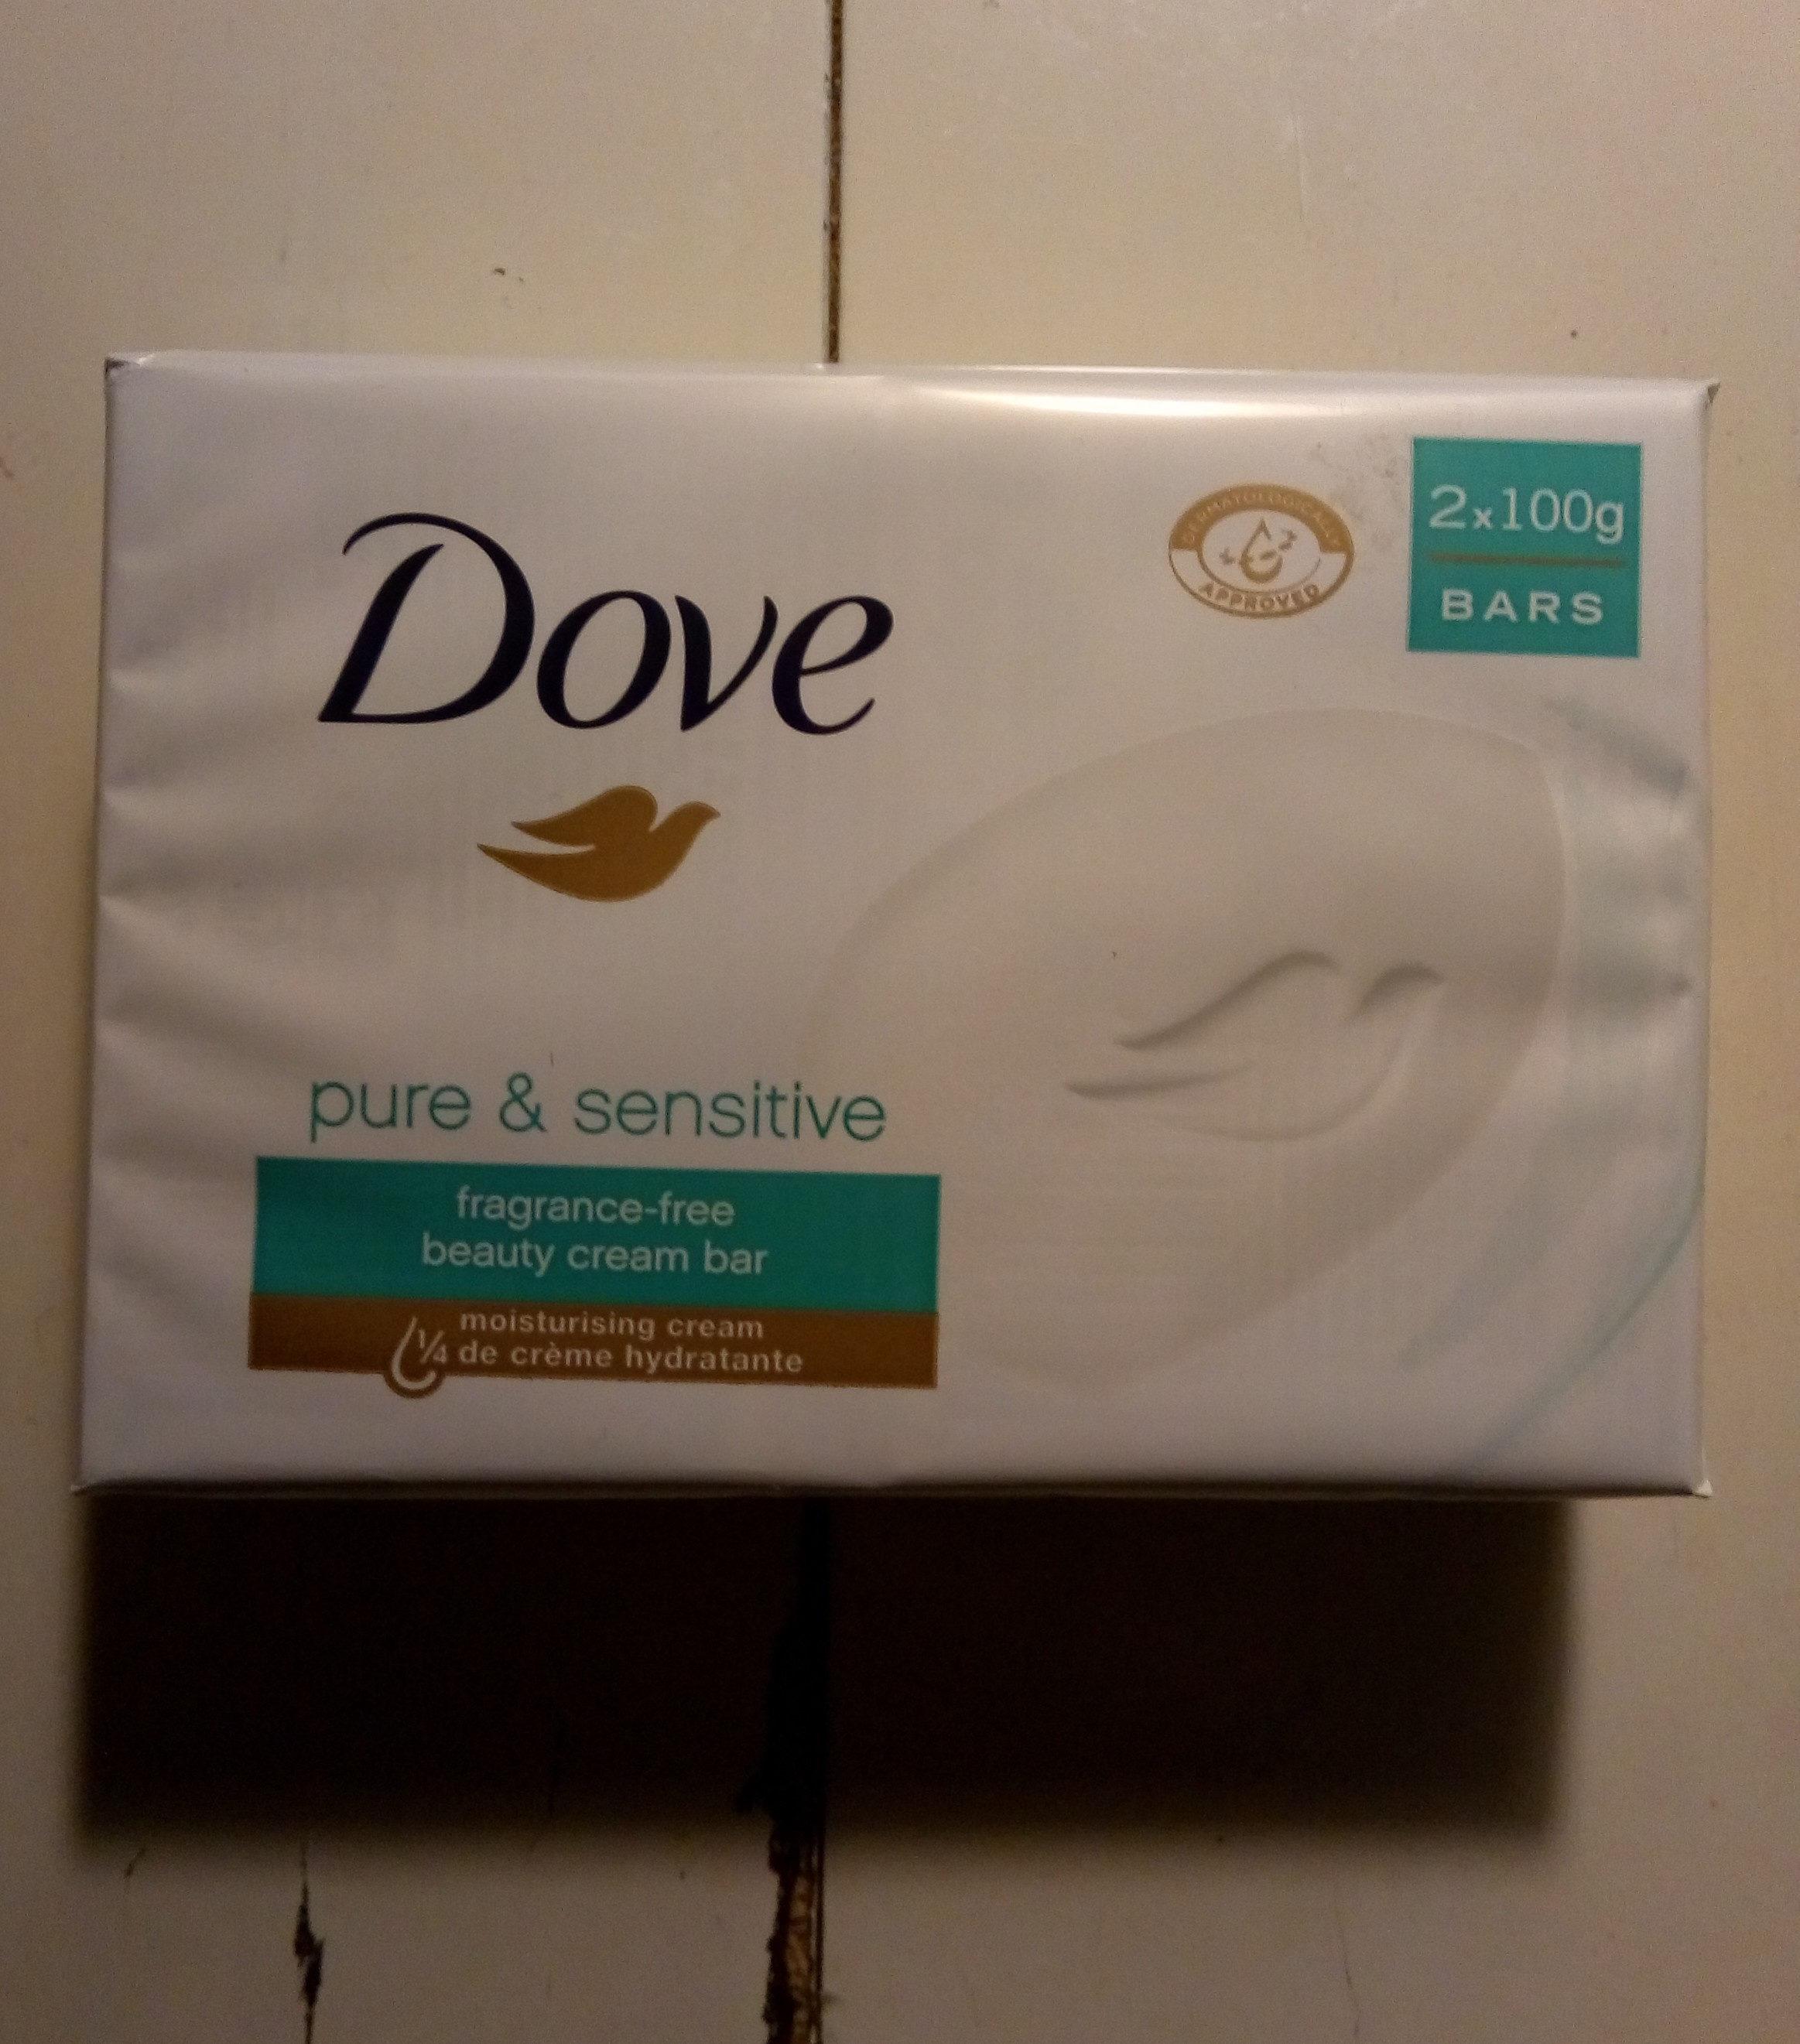 Dove pure & sensitive - Product - en